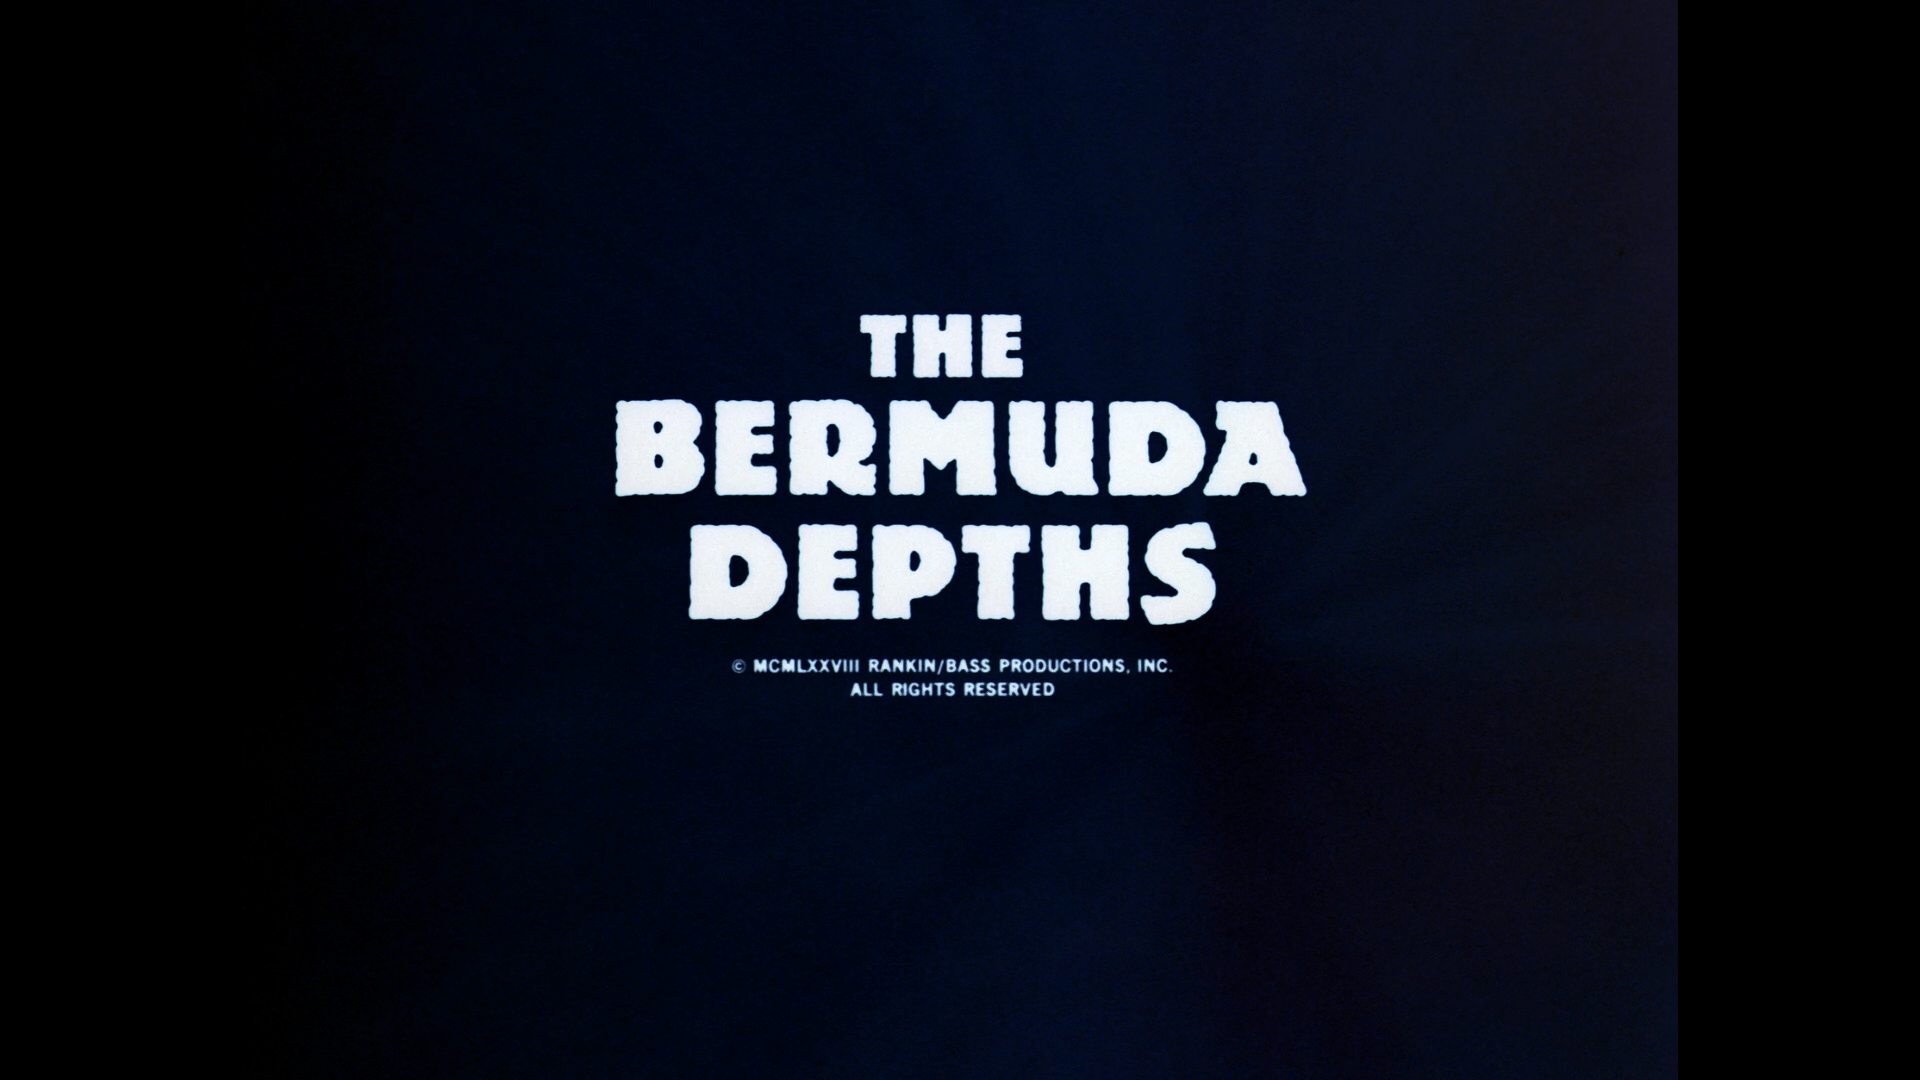 the bermuda depths title